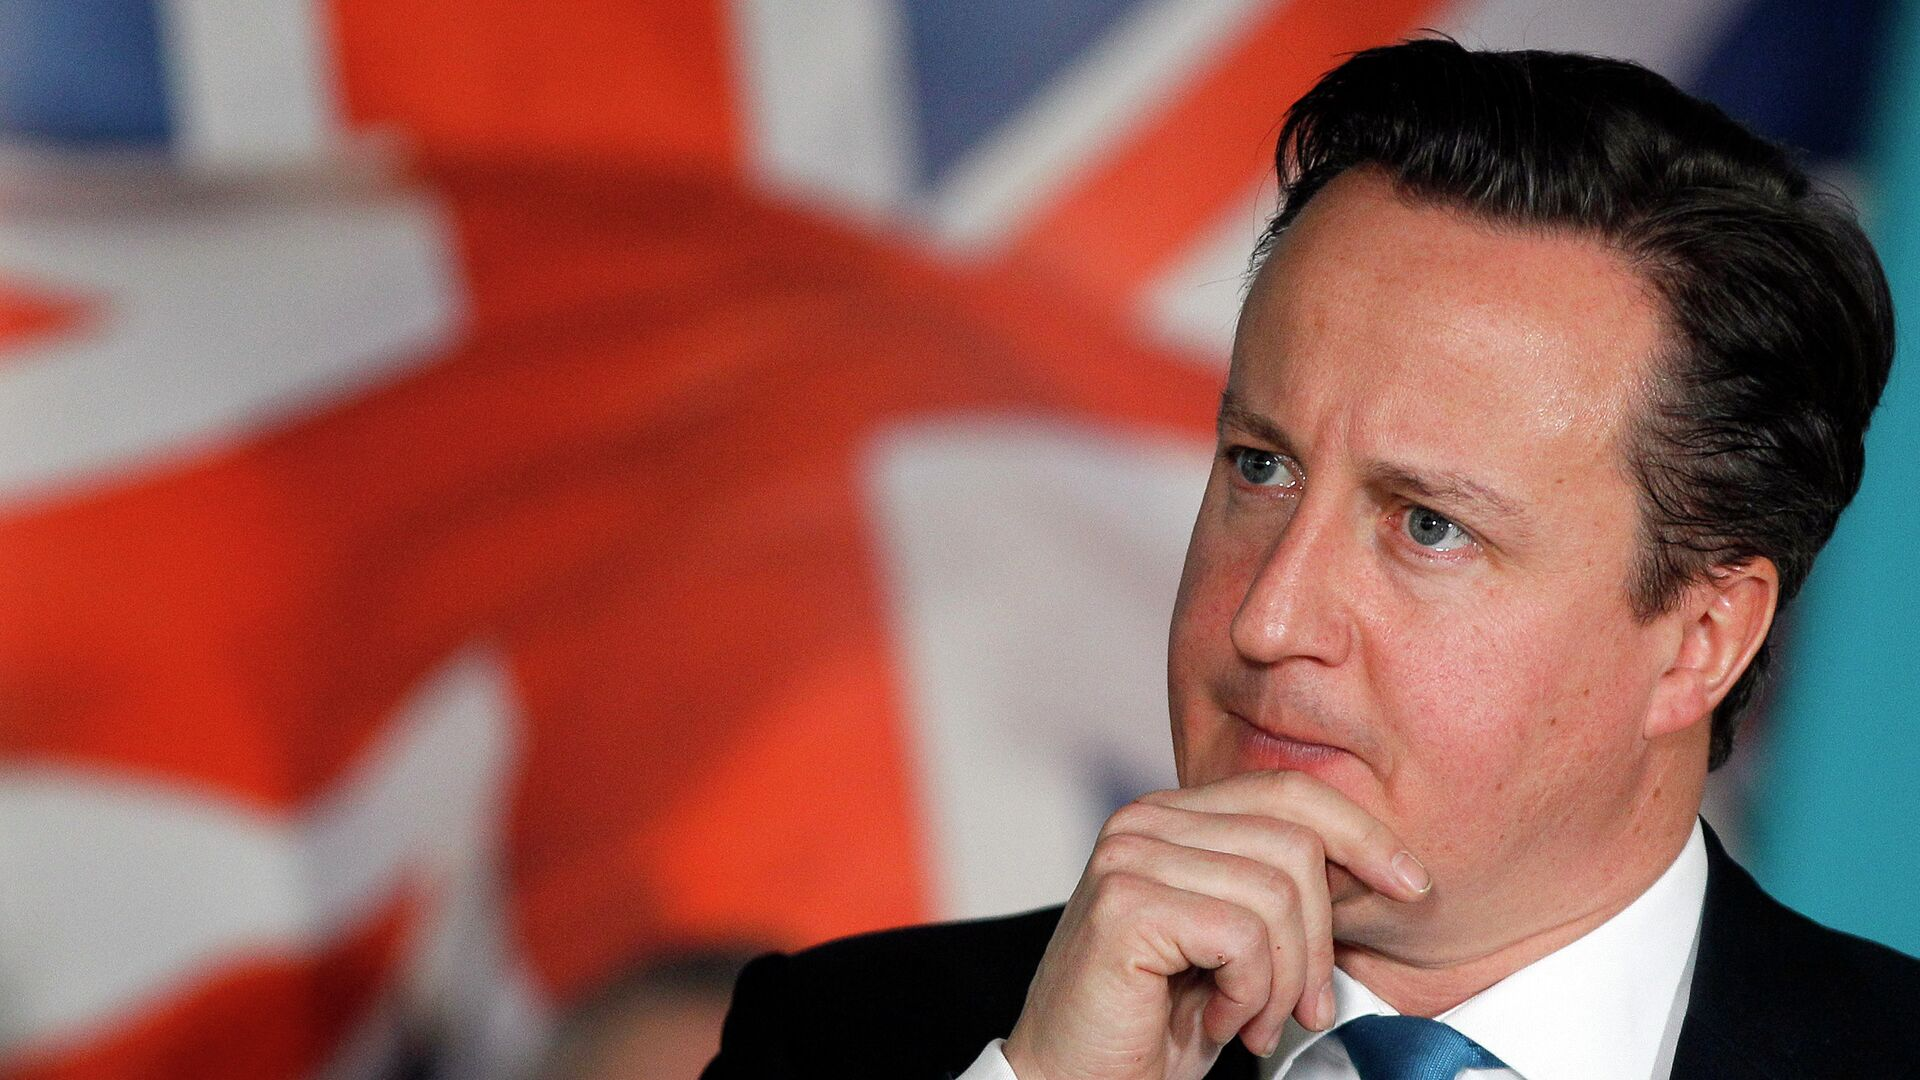 Ex primer ministro británico David Cameron - Sputnik Mundo, 1920, 13.04.2021